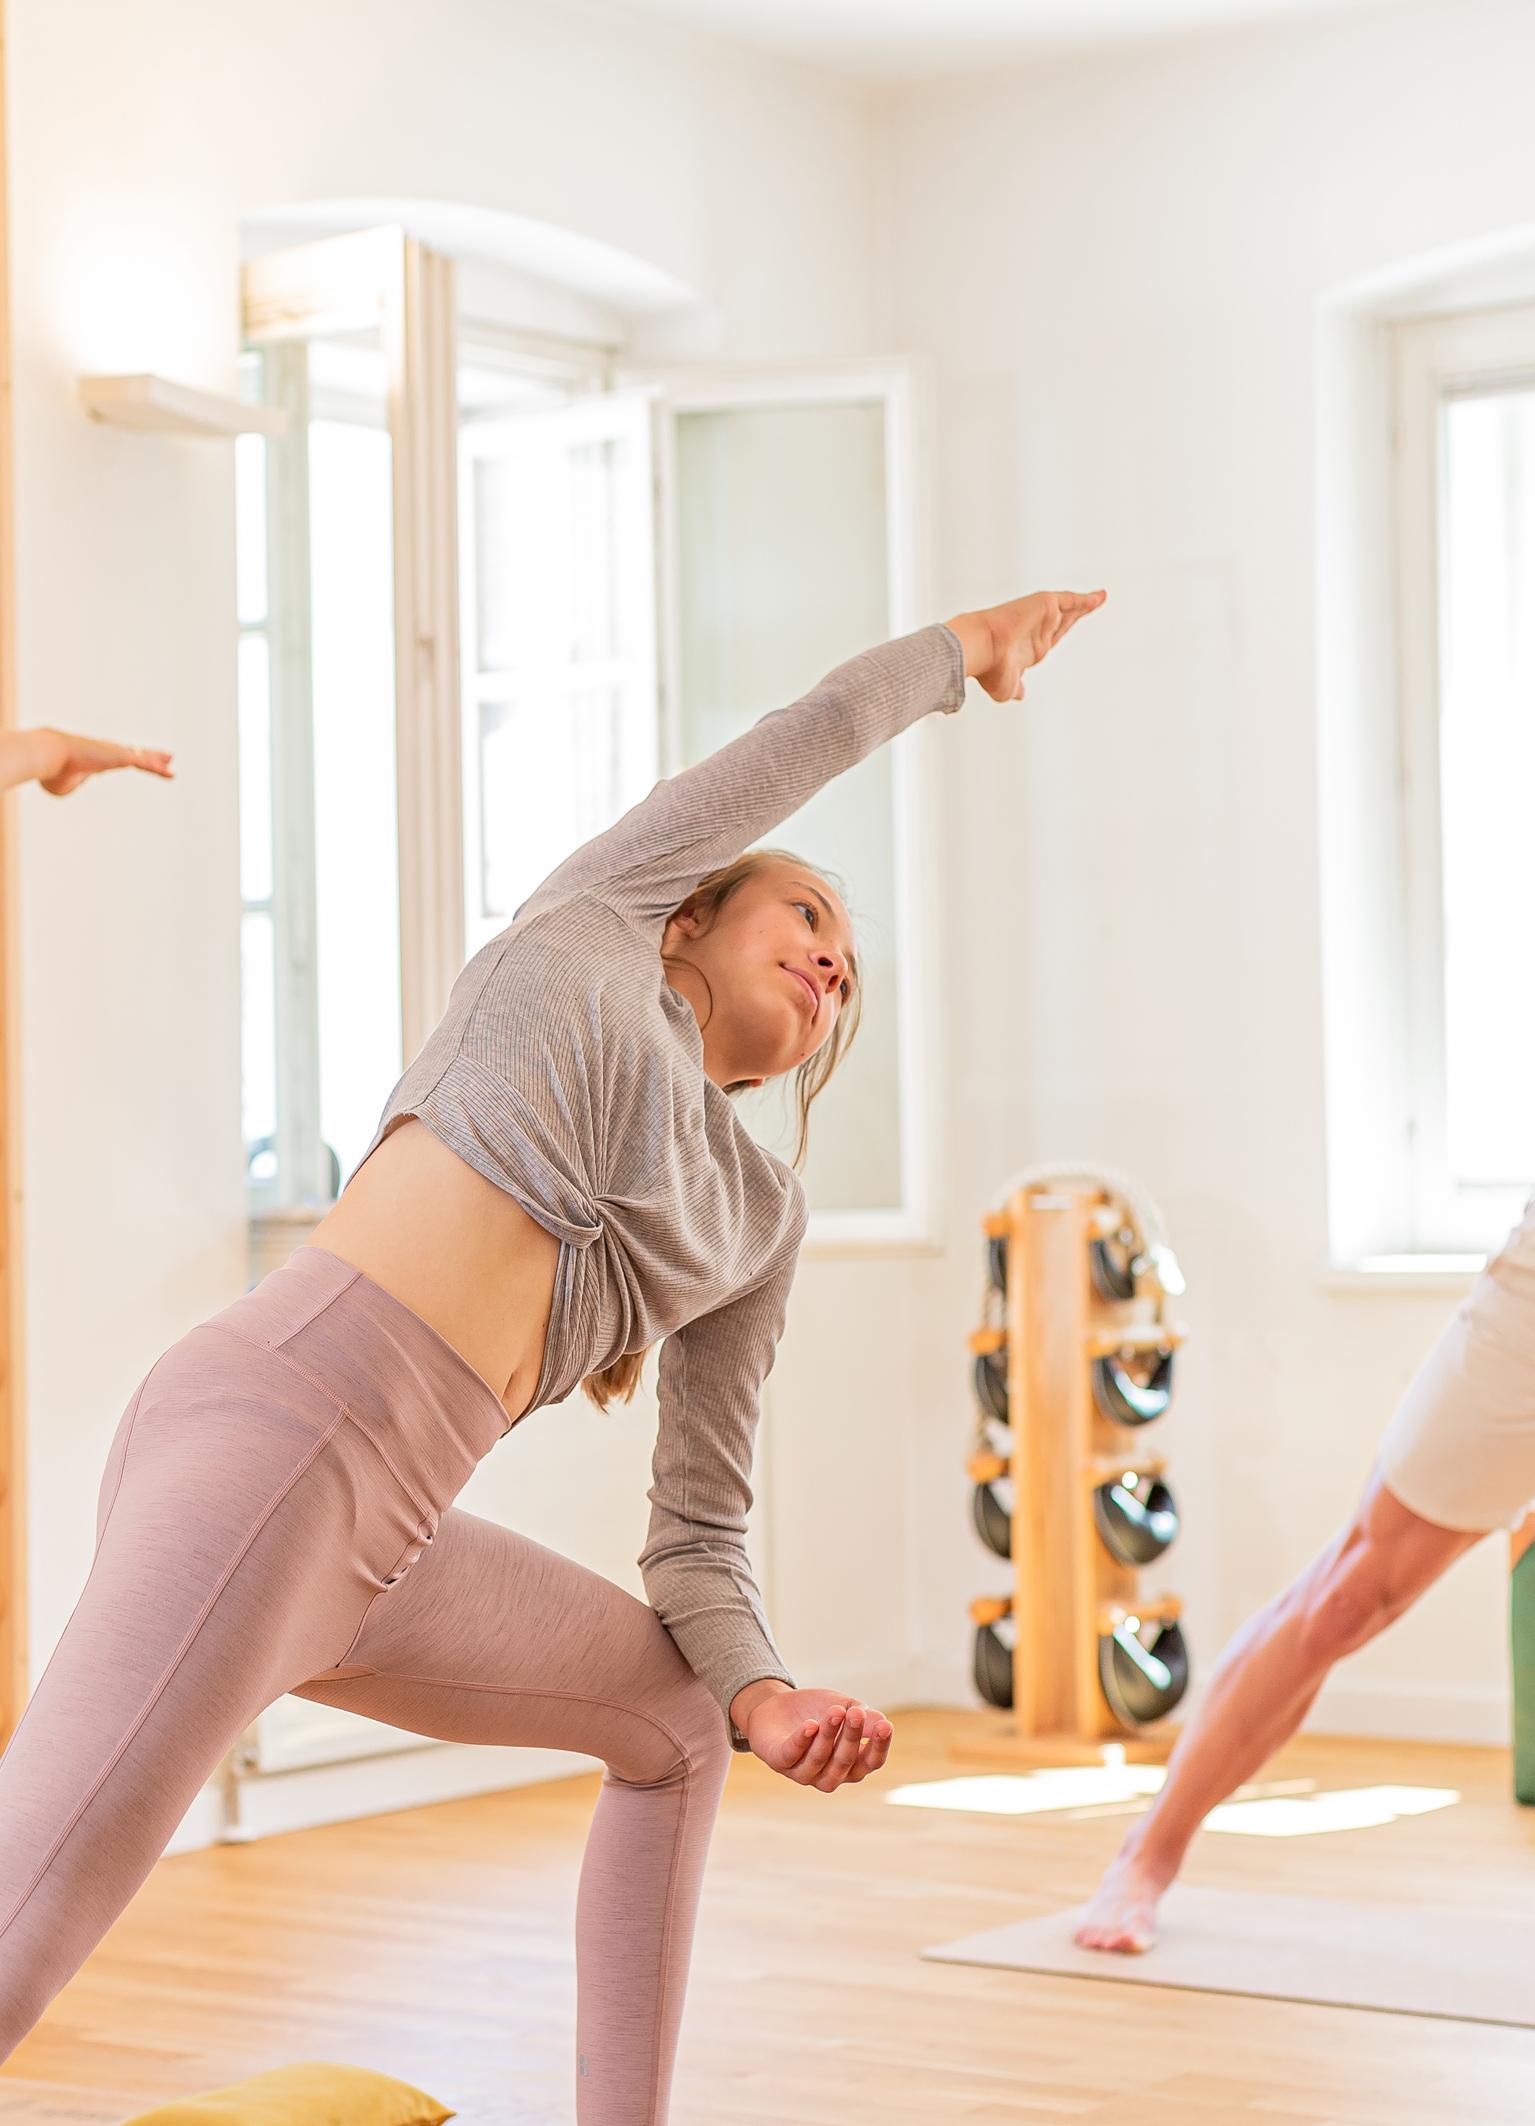 praxis_sykora_therapie-yoga-training_waidhofen_ludwigfahrnberger_neu